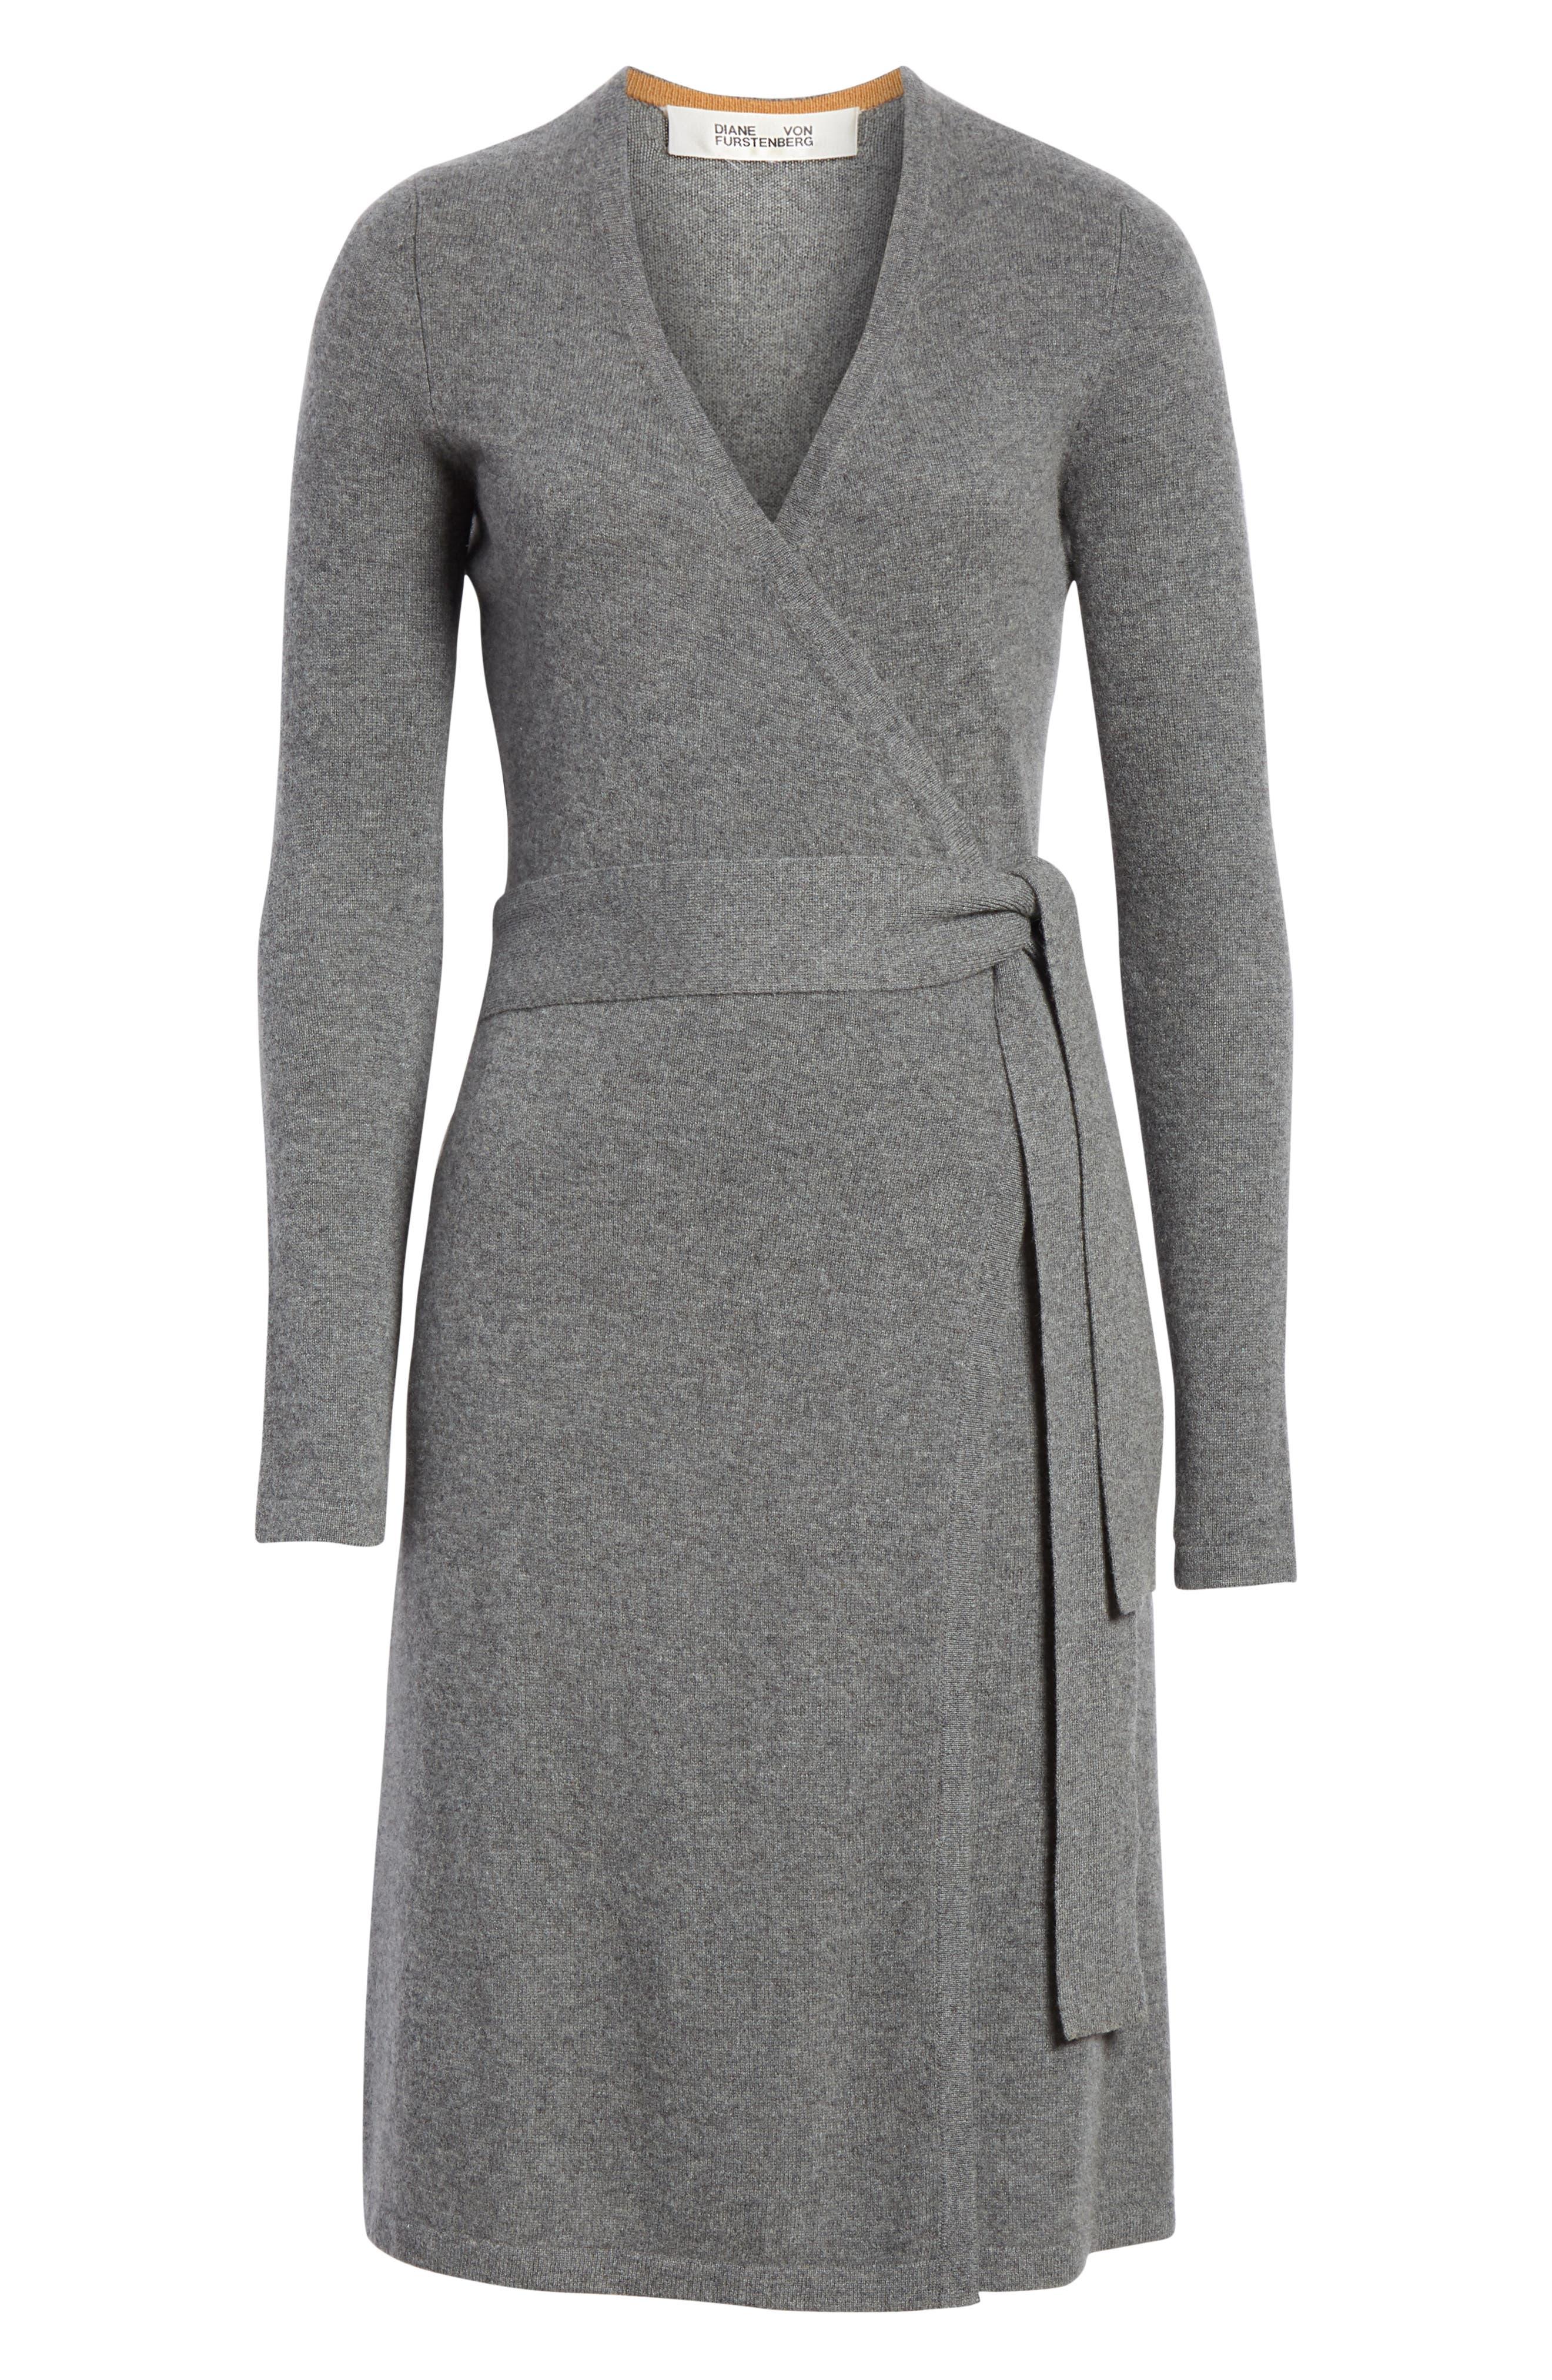 Diane Von Furstenberg Linda Cashmere Wrap Dress,                             Alternate thumbnail 6, color,                             Charcoal Melange